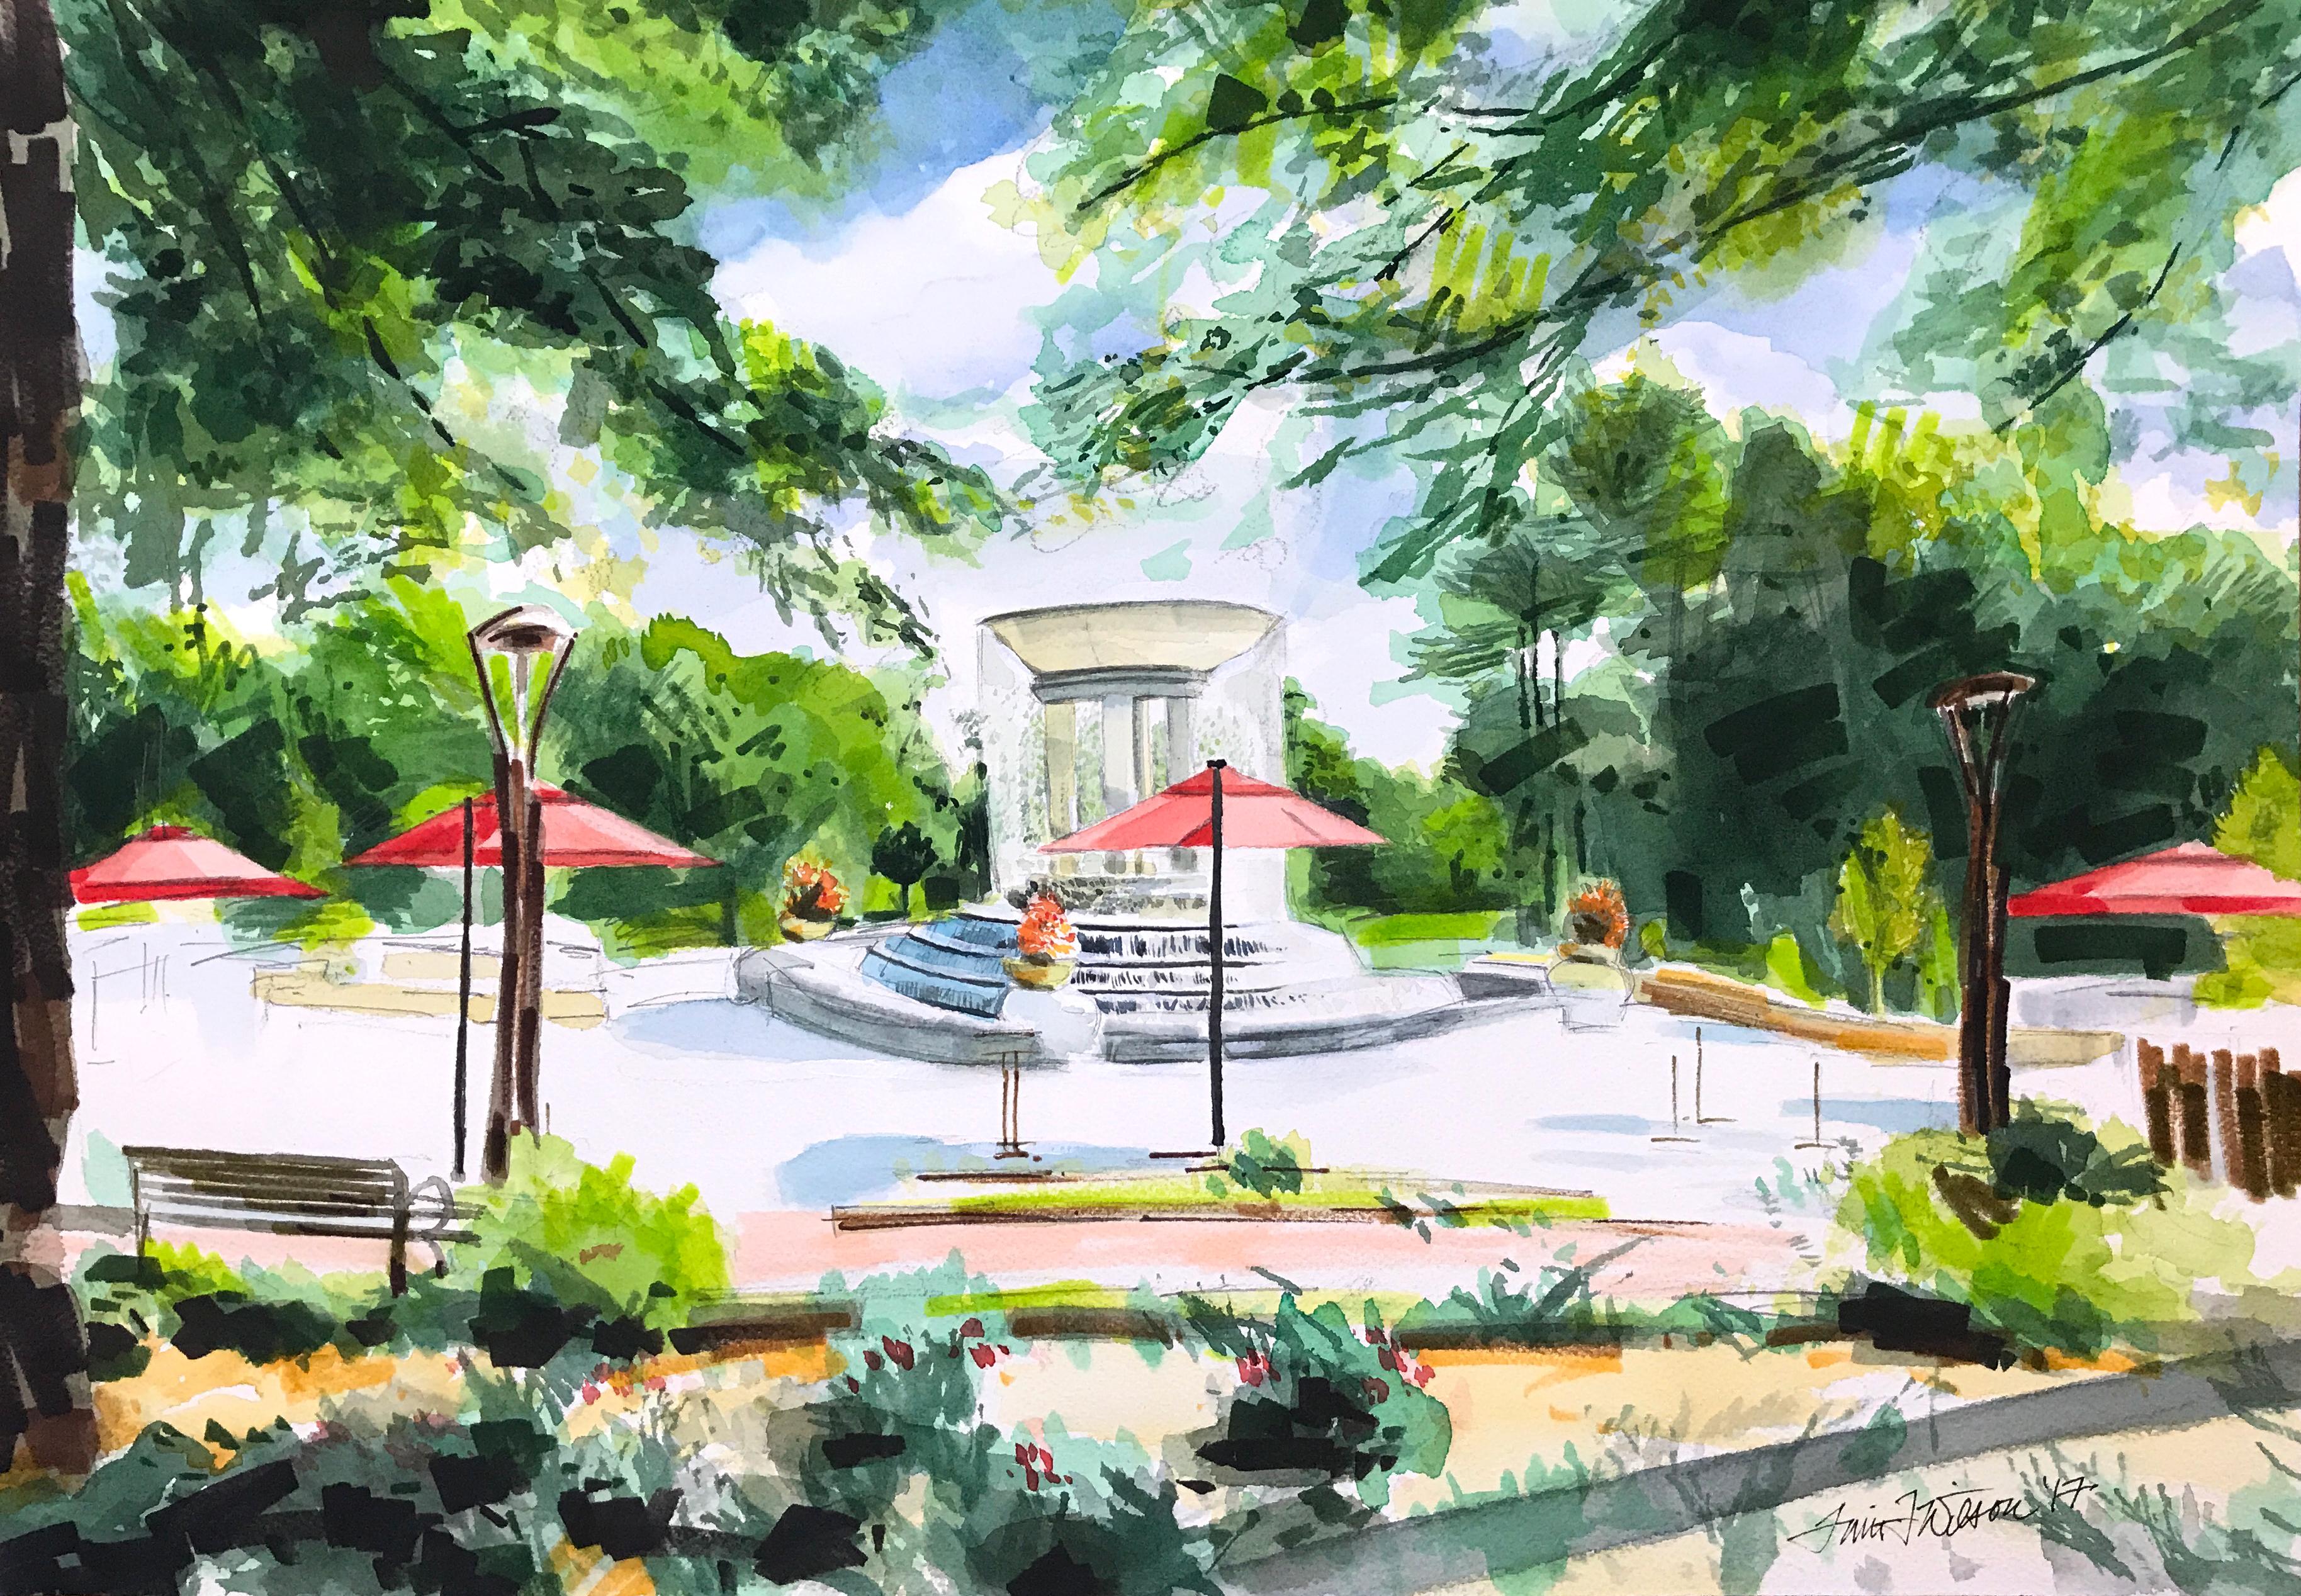 Cary Fountain - Cary, NC